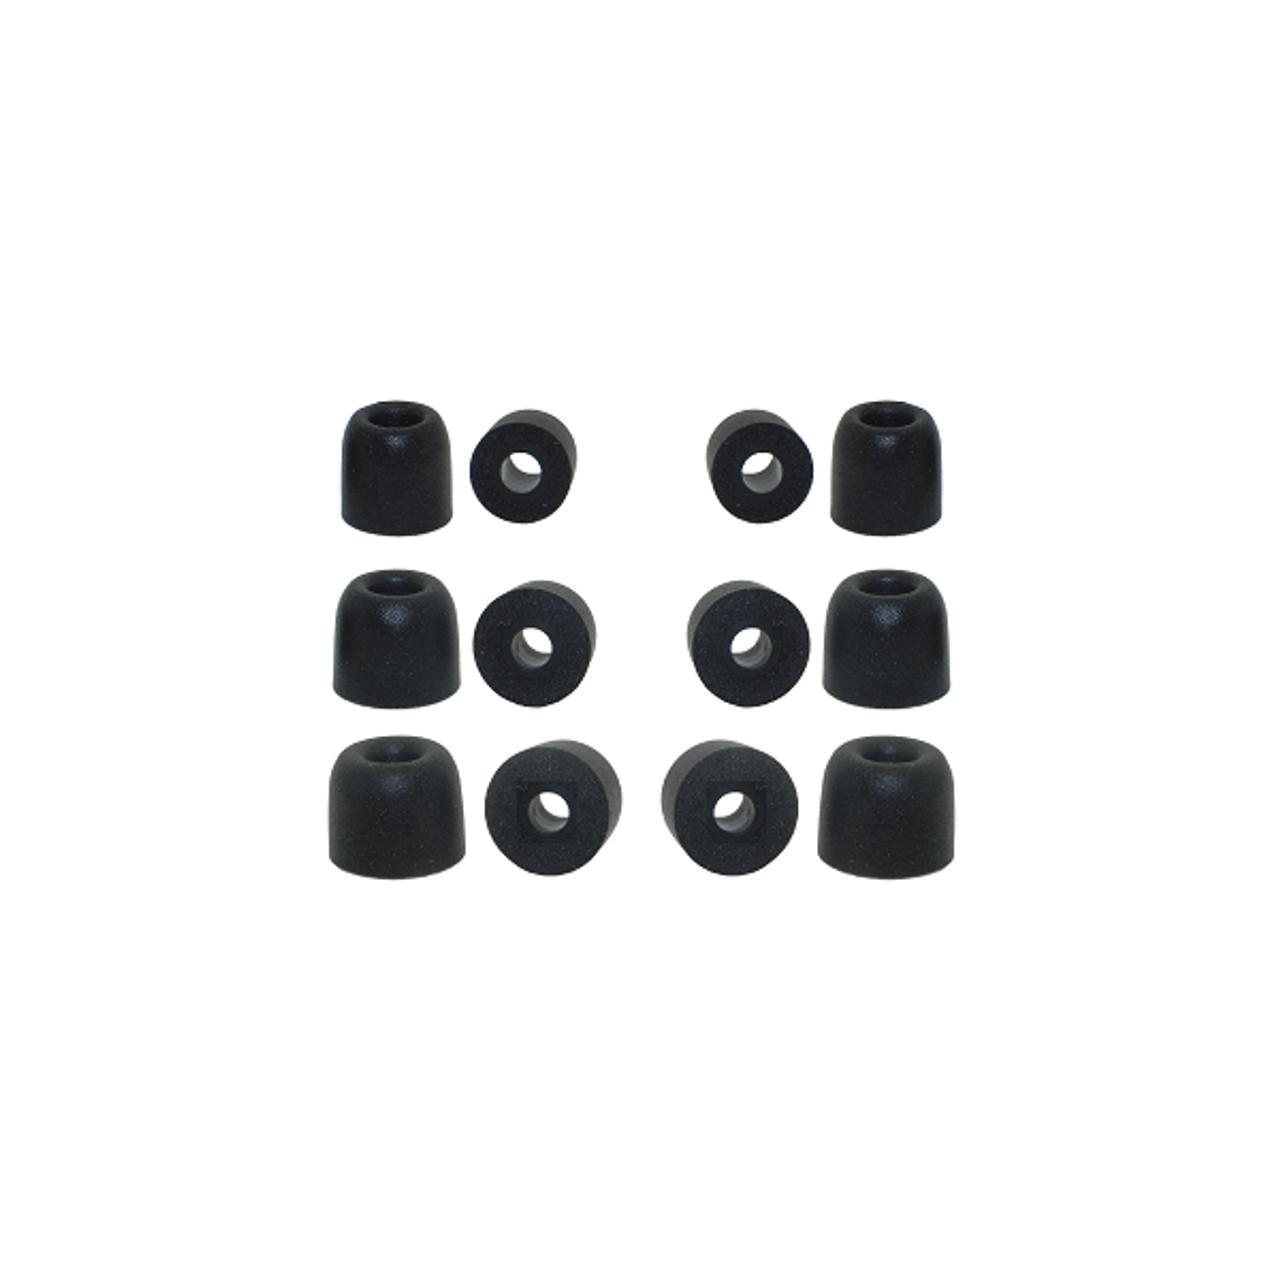 replacement eartips for skullcandy ear gels